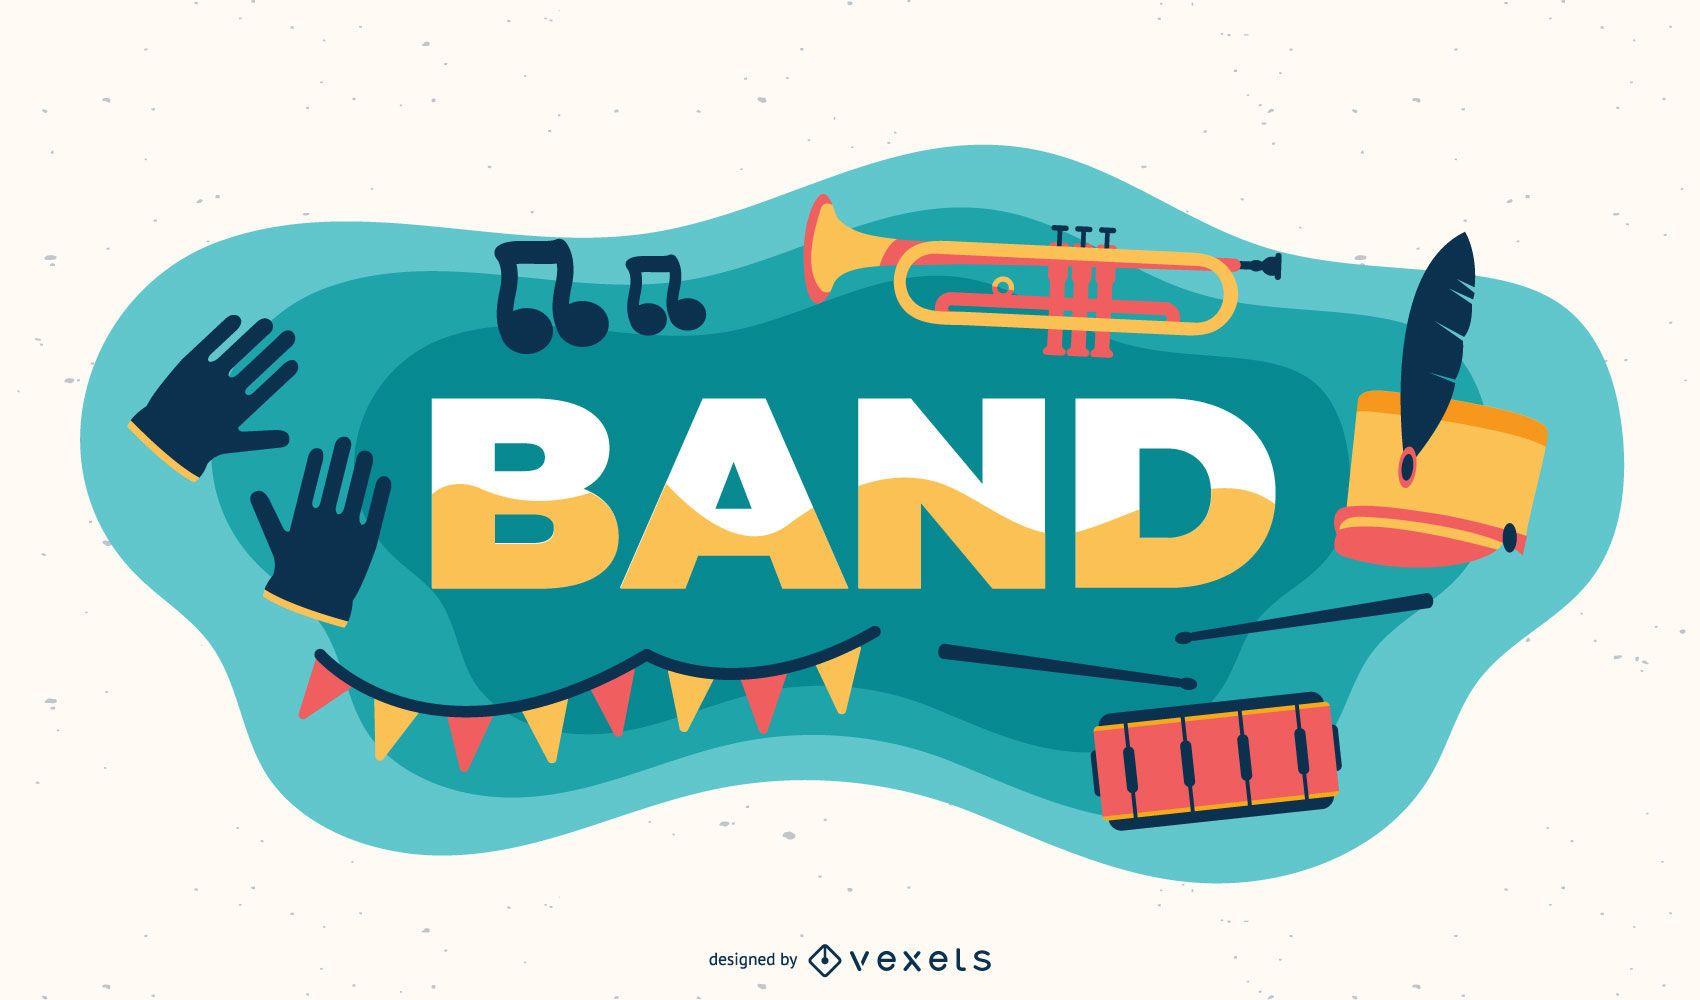 Band subject illustration